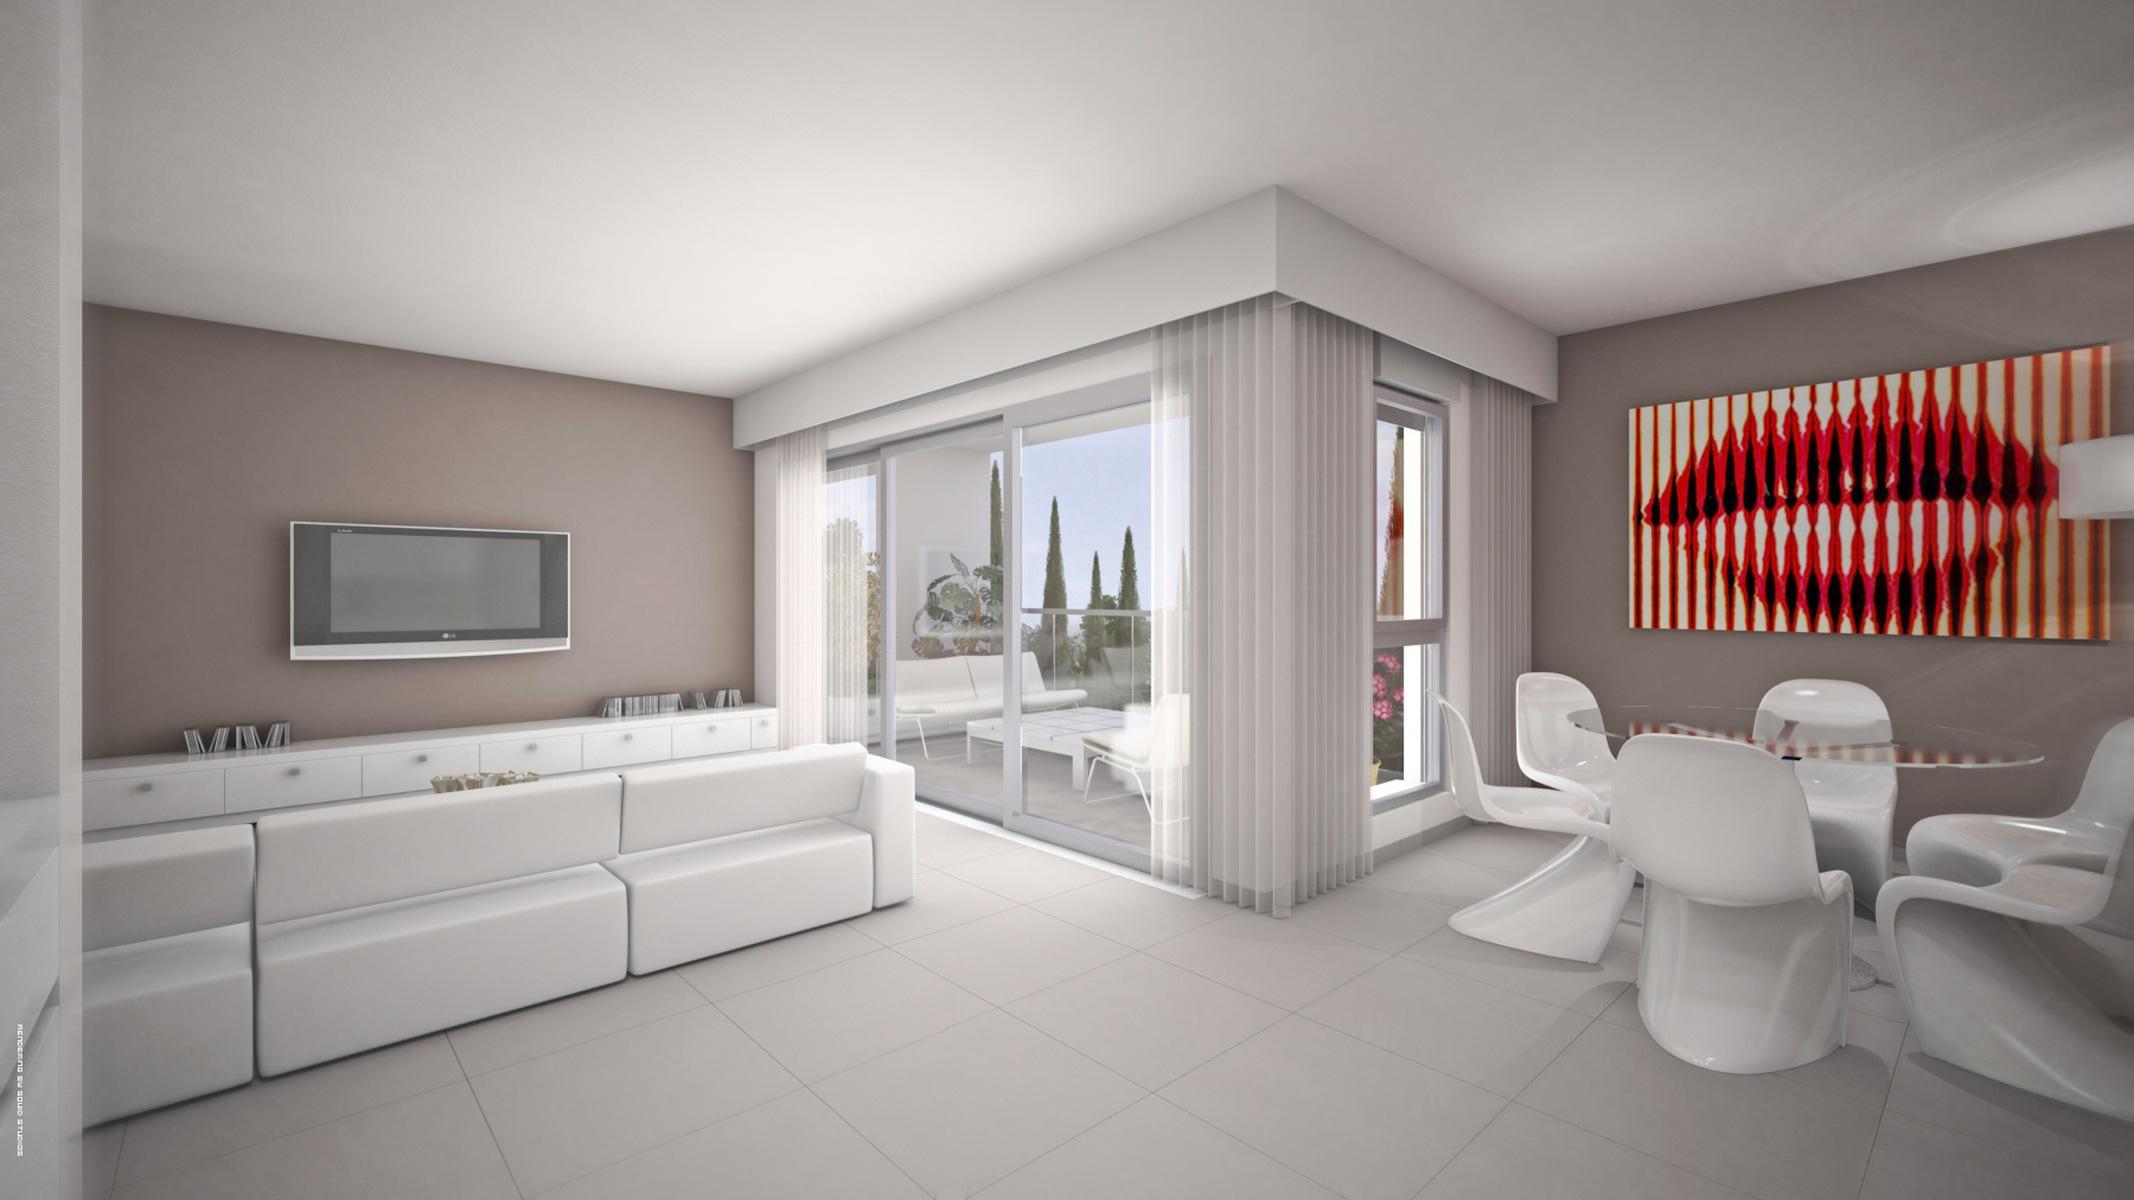 New three bedroom apartment in Nicosia